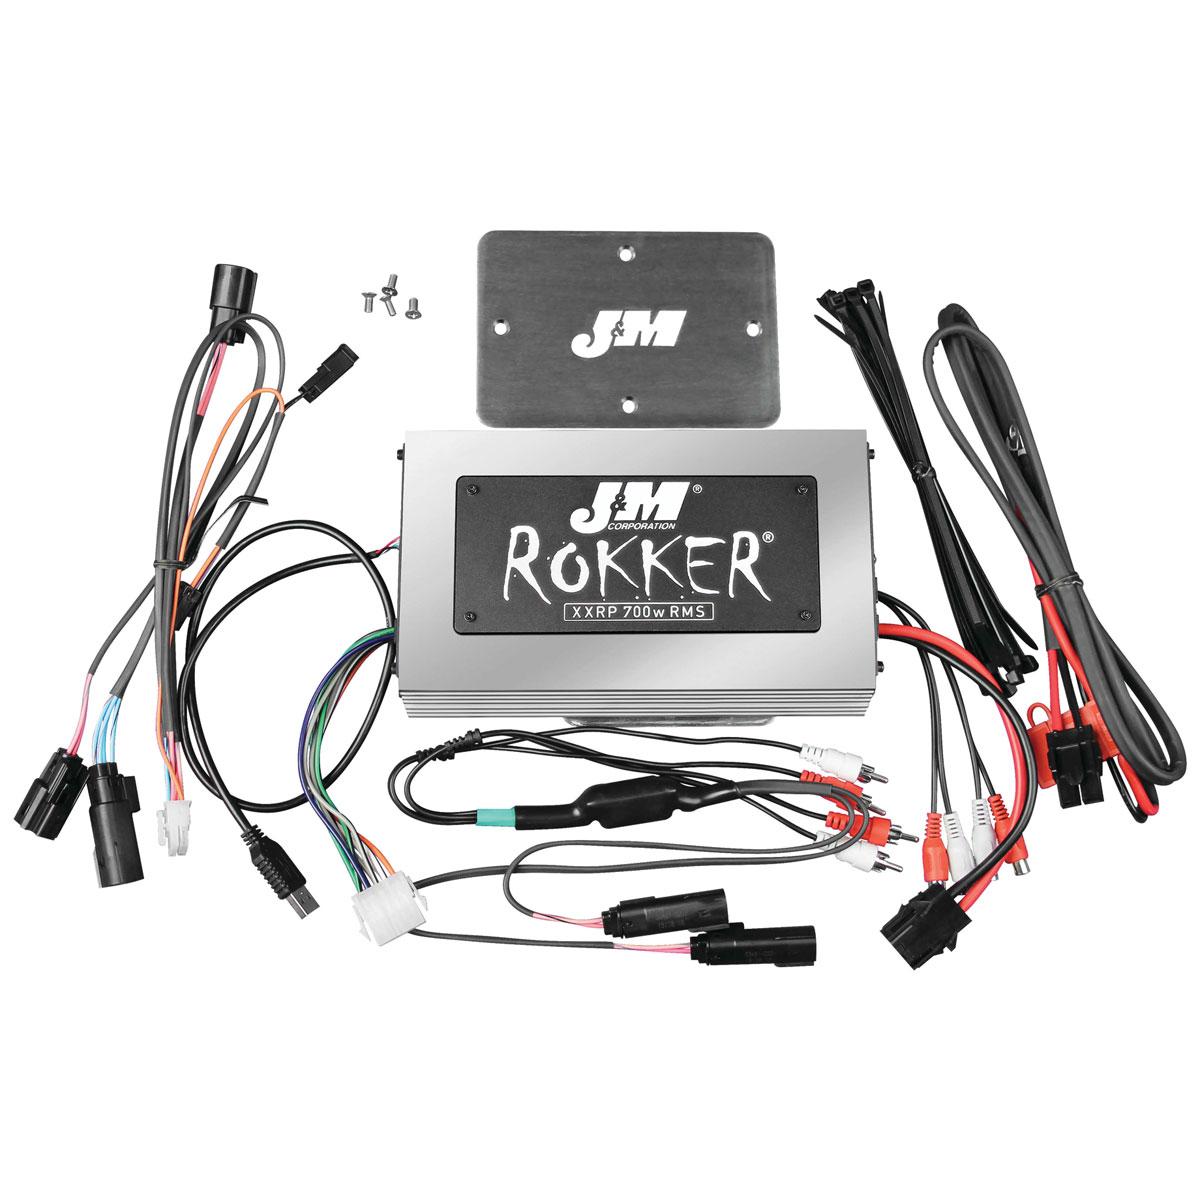 J&M Rokker XXRP 700W Amplifier Kit - JAMP-700HR15-RCP